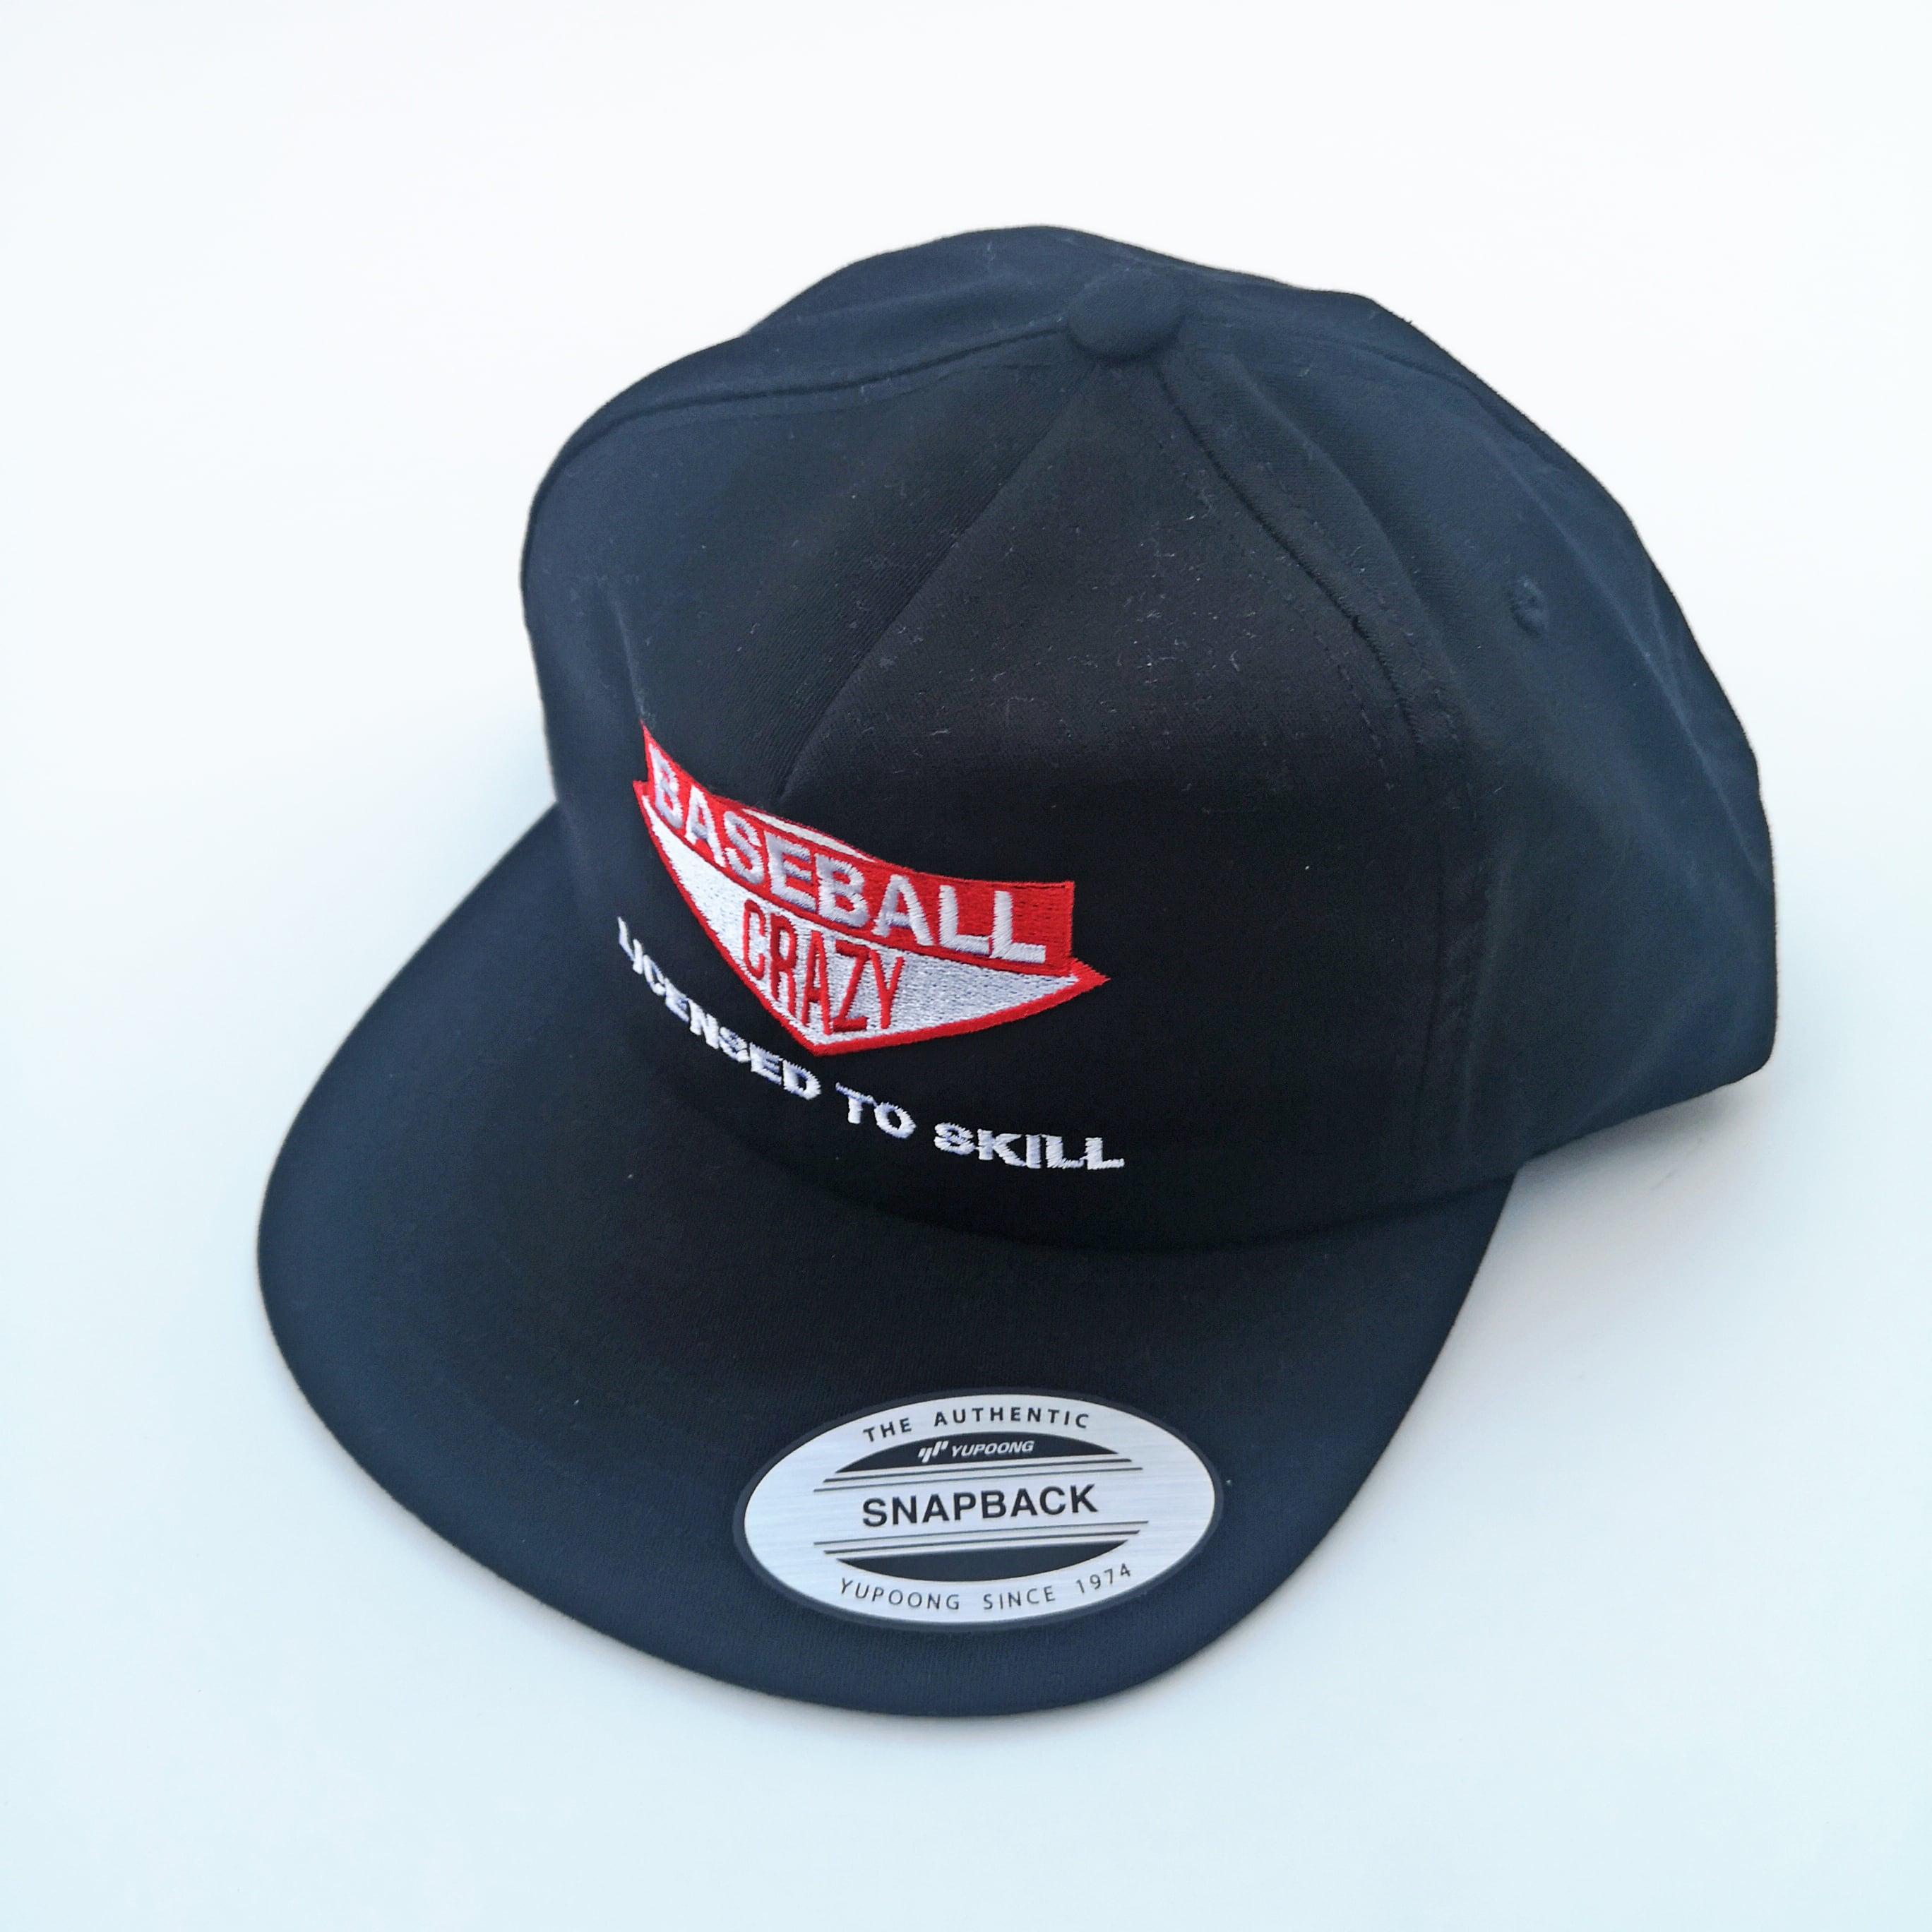 BASEBALL CRAZY CAP 2nd Ver.